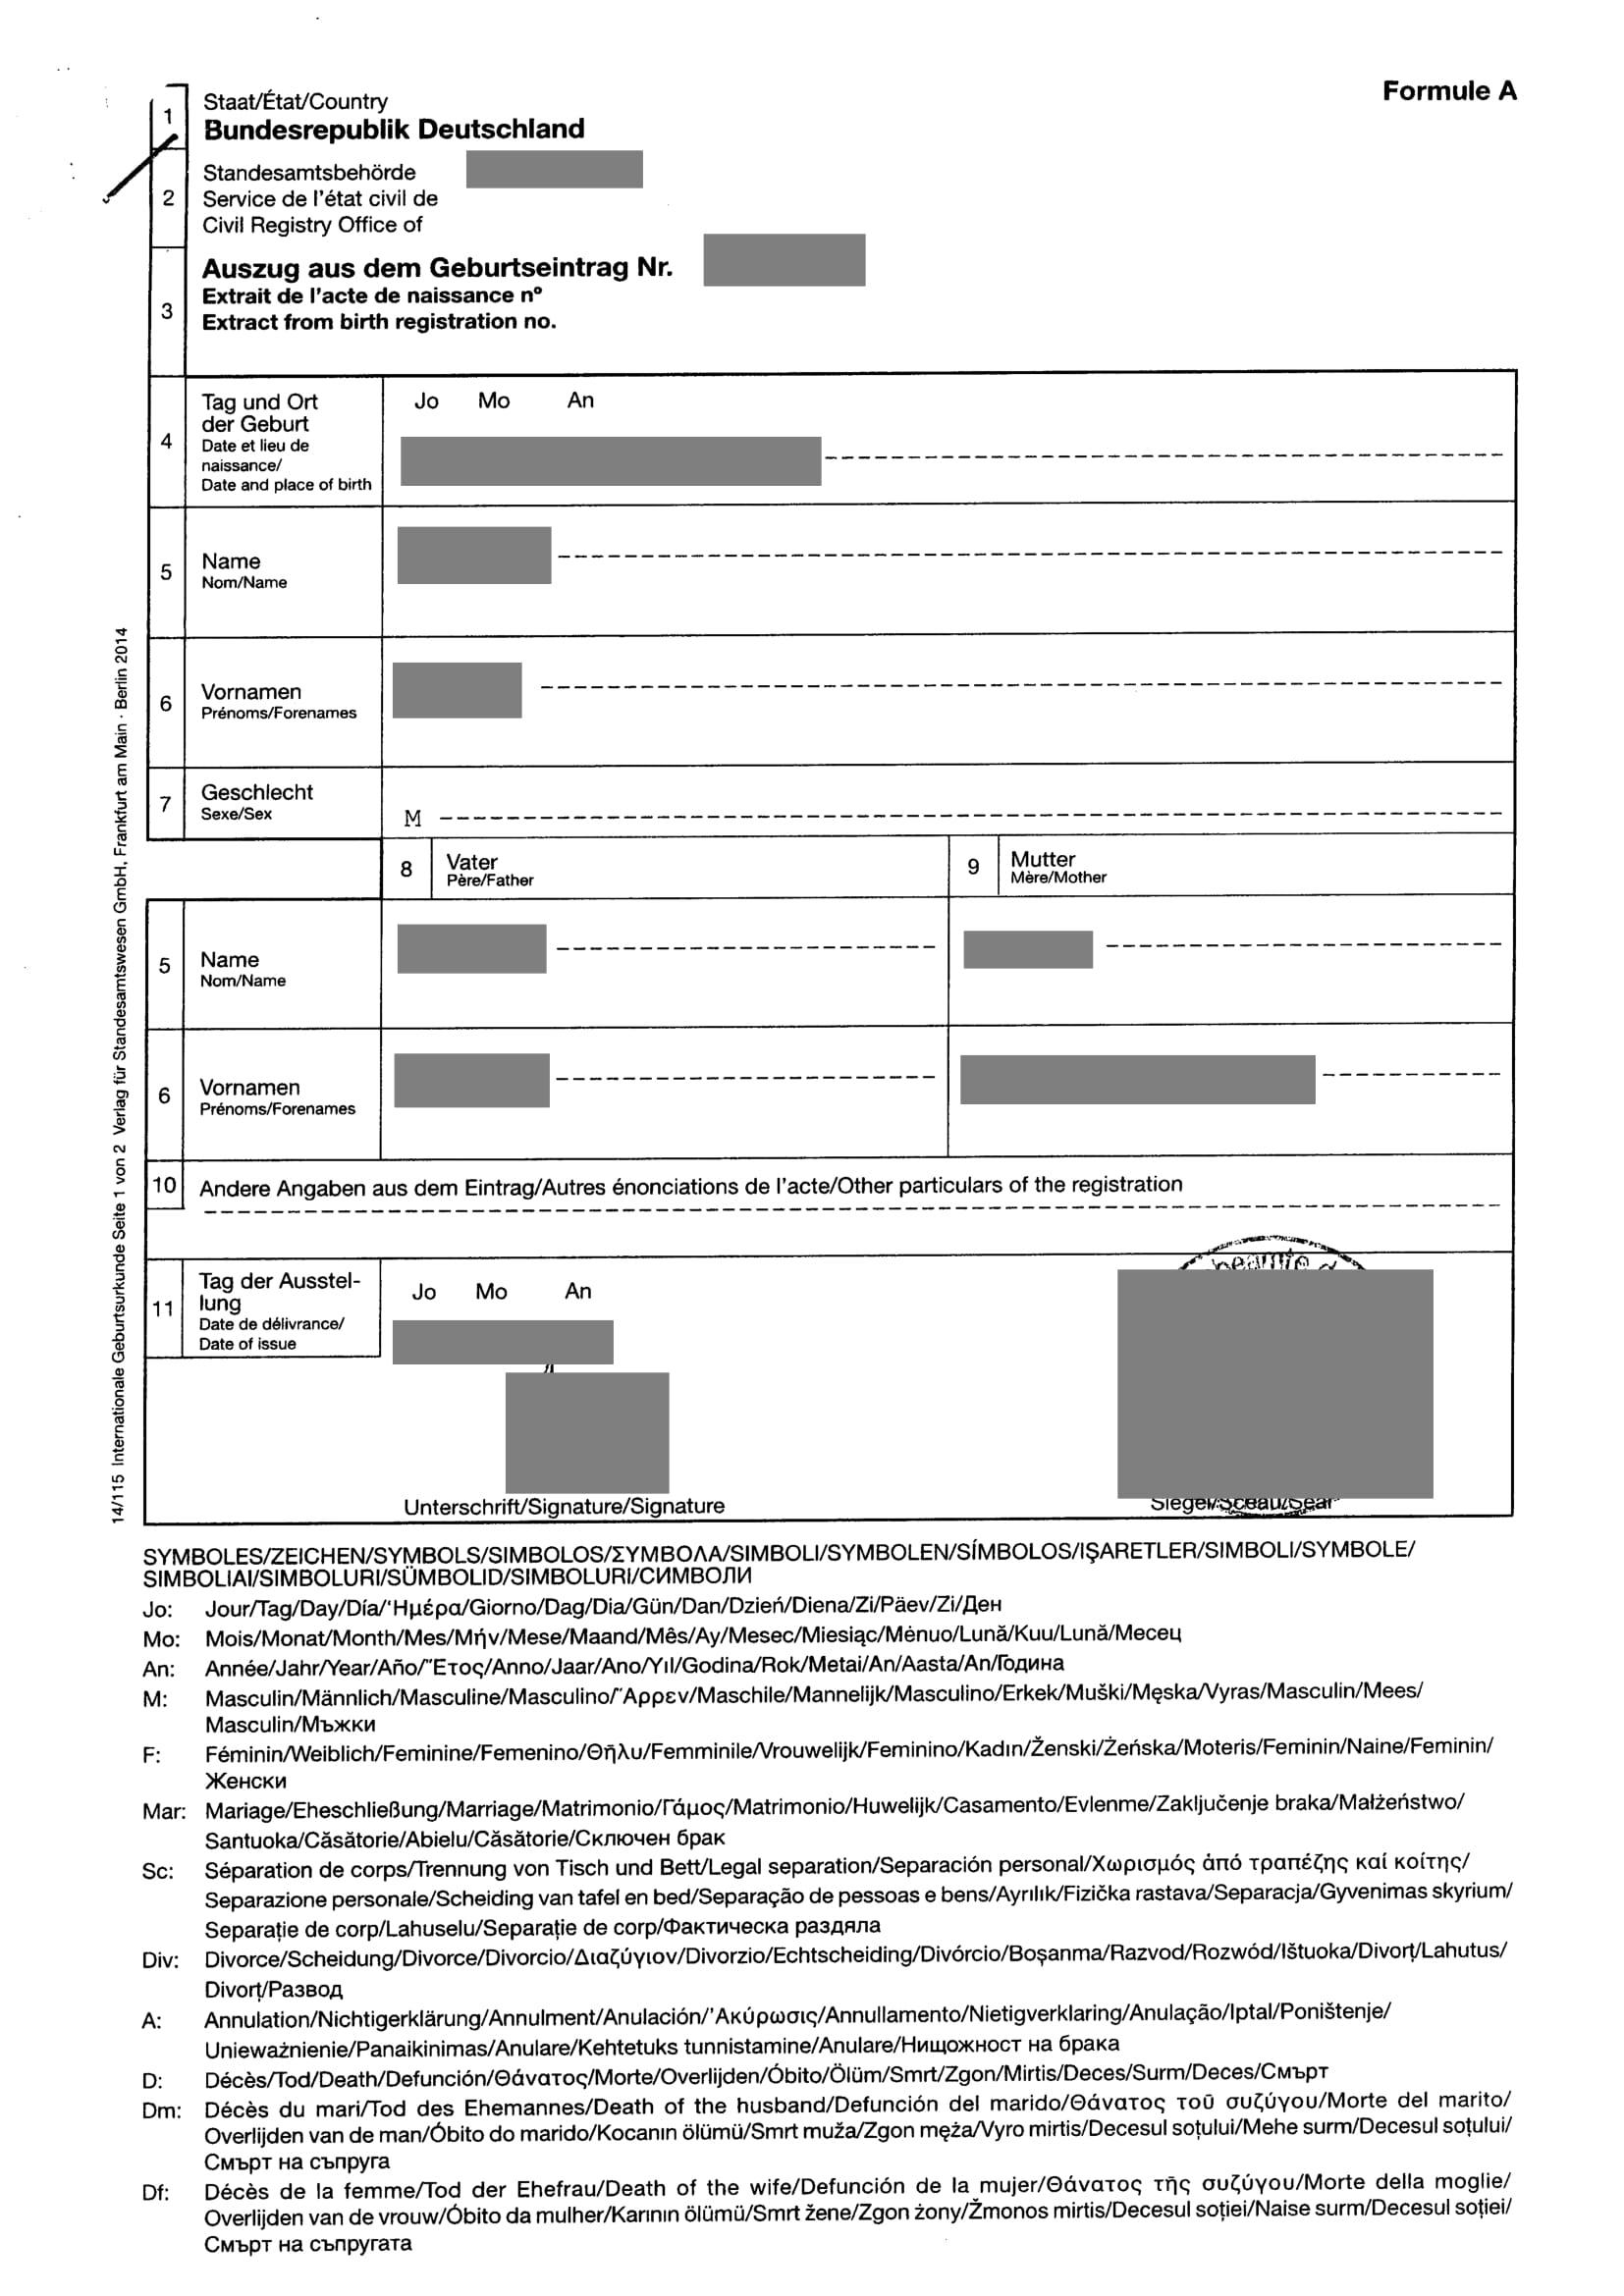 Geburtenregister dem auszug berlin aus documents.openideo.com